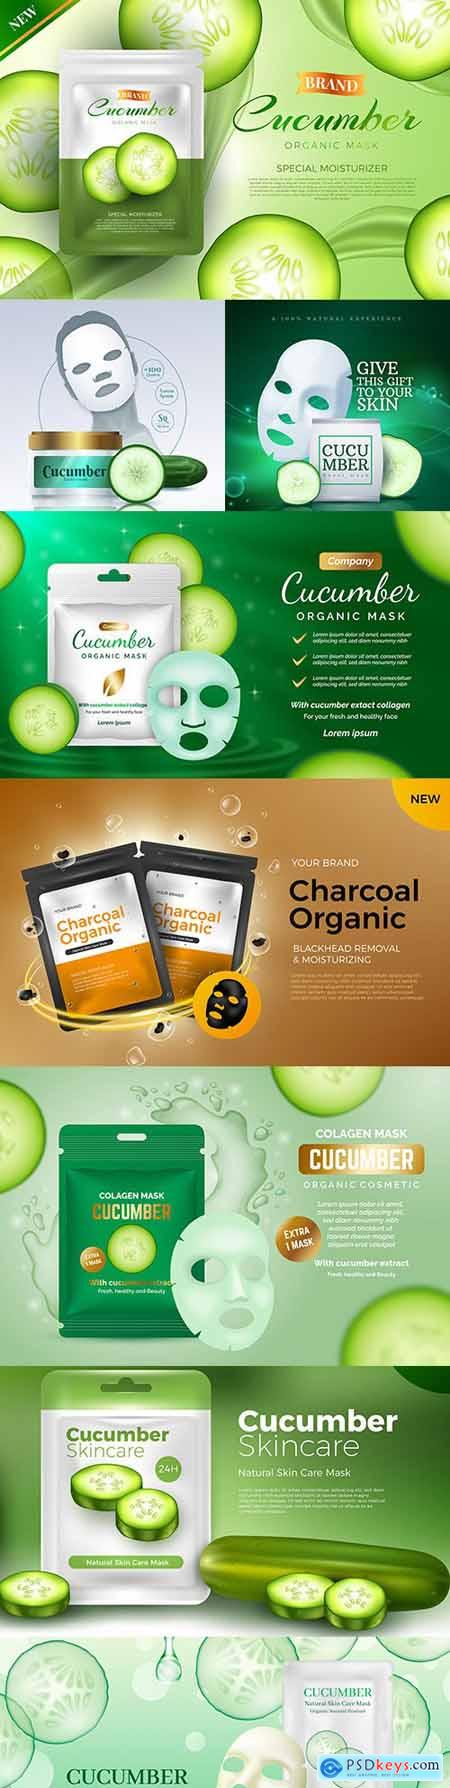 Realistic cucumber sheet mask design template